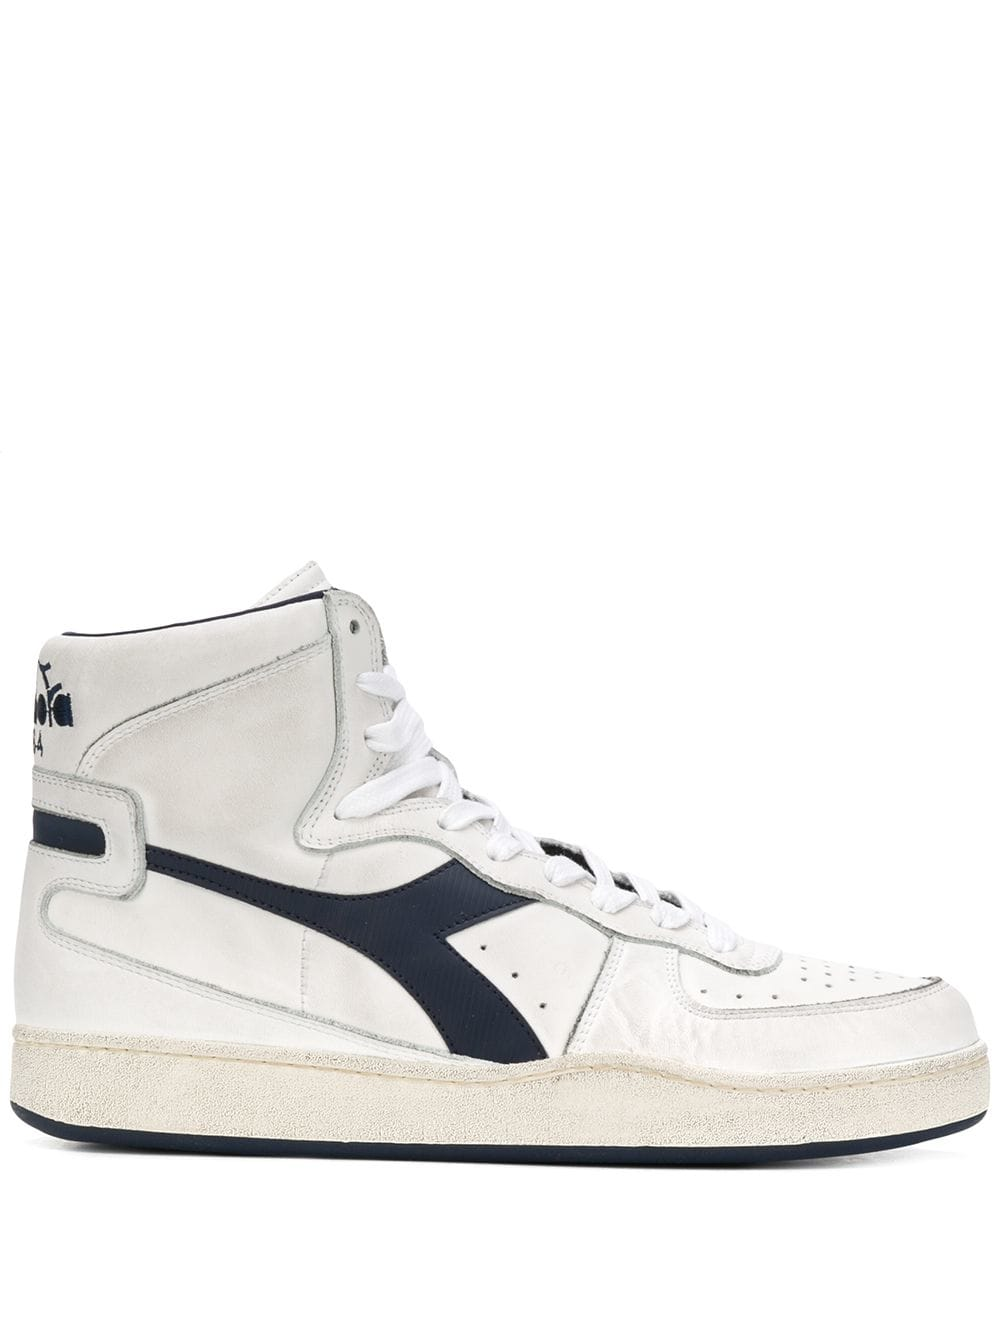 6610c49b Diadora Mi Basket hi-top sneakers - White in 2019   Products ...